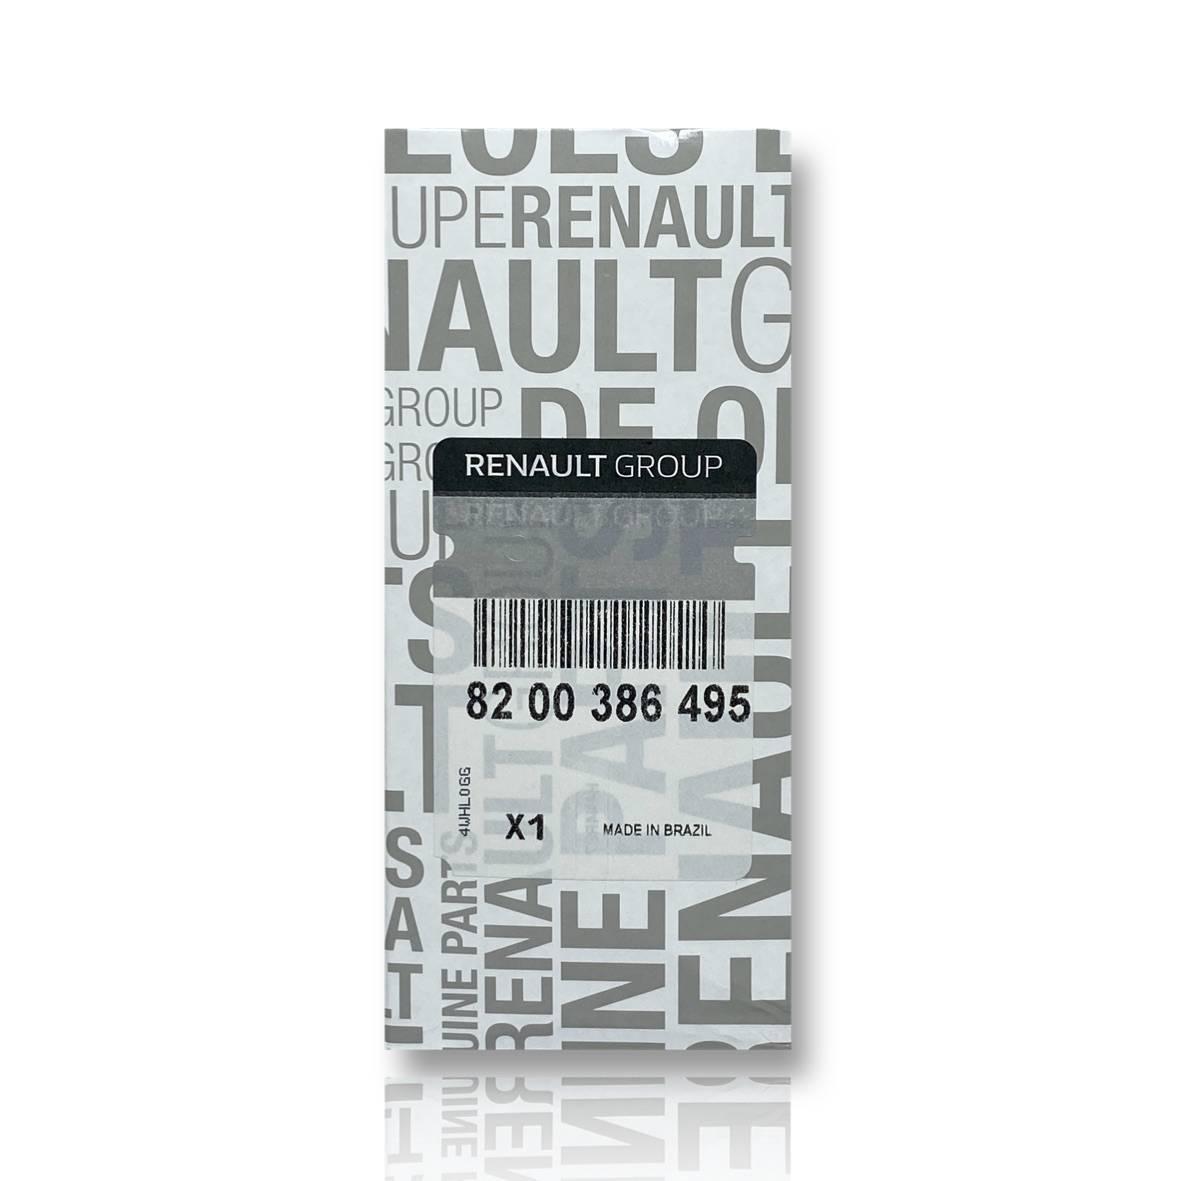 Filtro de combustível - Renault motor F4R - 82 00 386 495 - PerformanceLUB Lubrificantes Premium